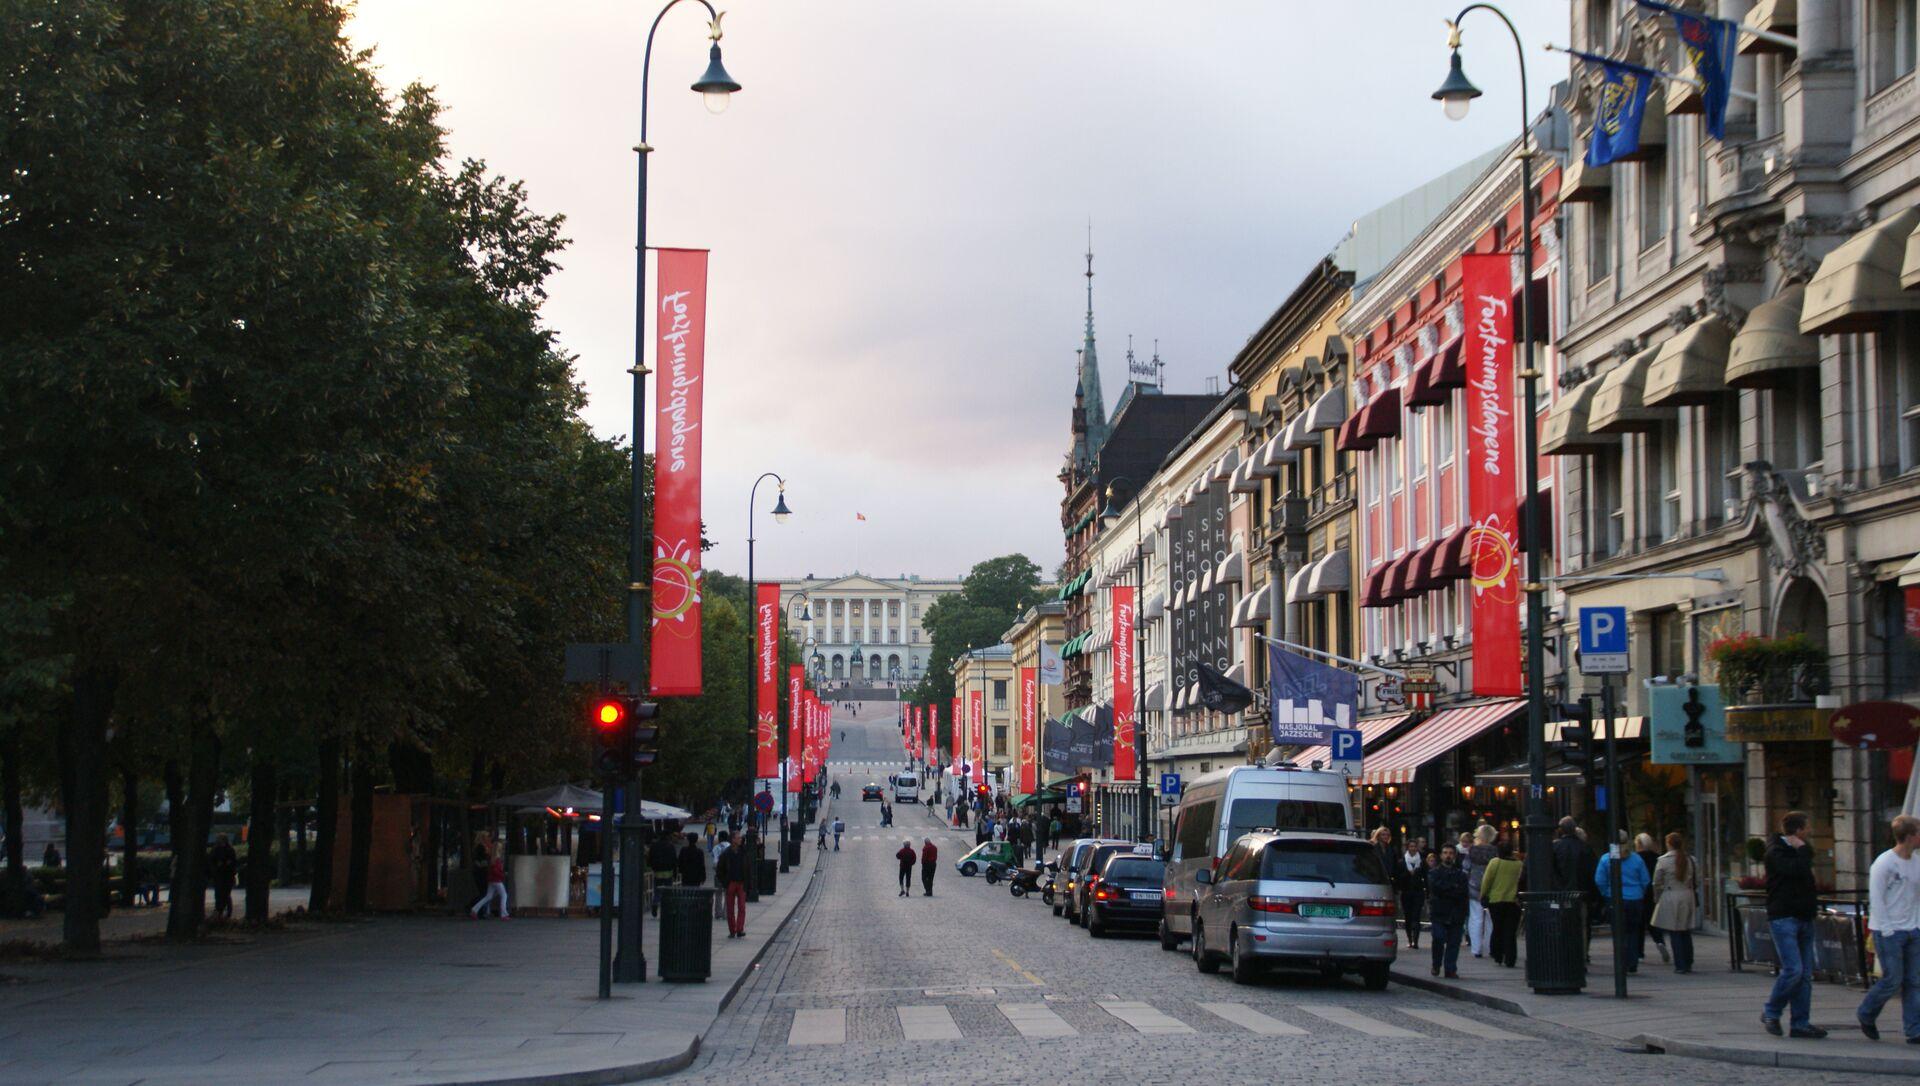 Karl Johan's Gate Street, Oslo - Sputnik International, 1920, 05.08.2021